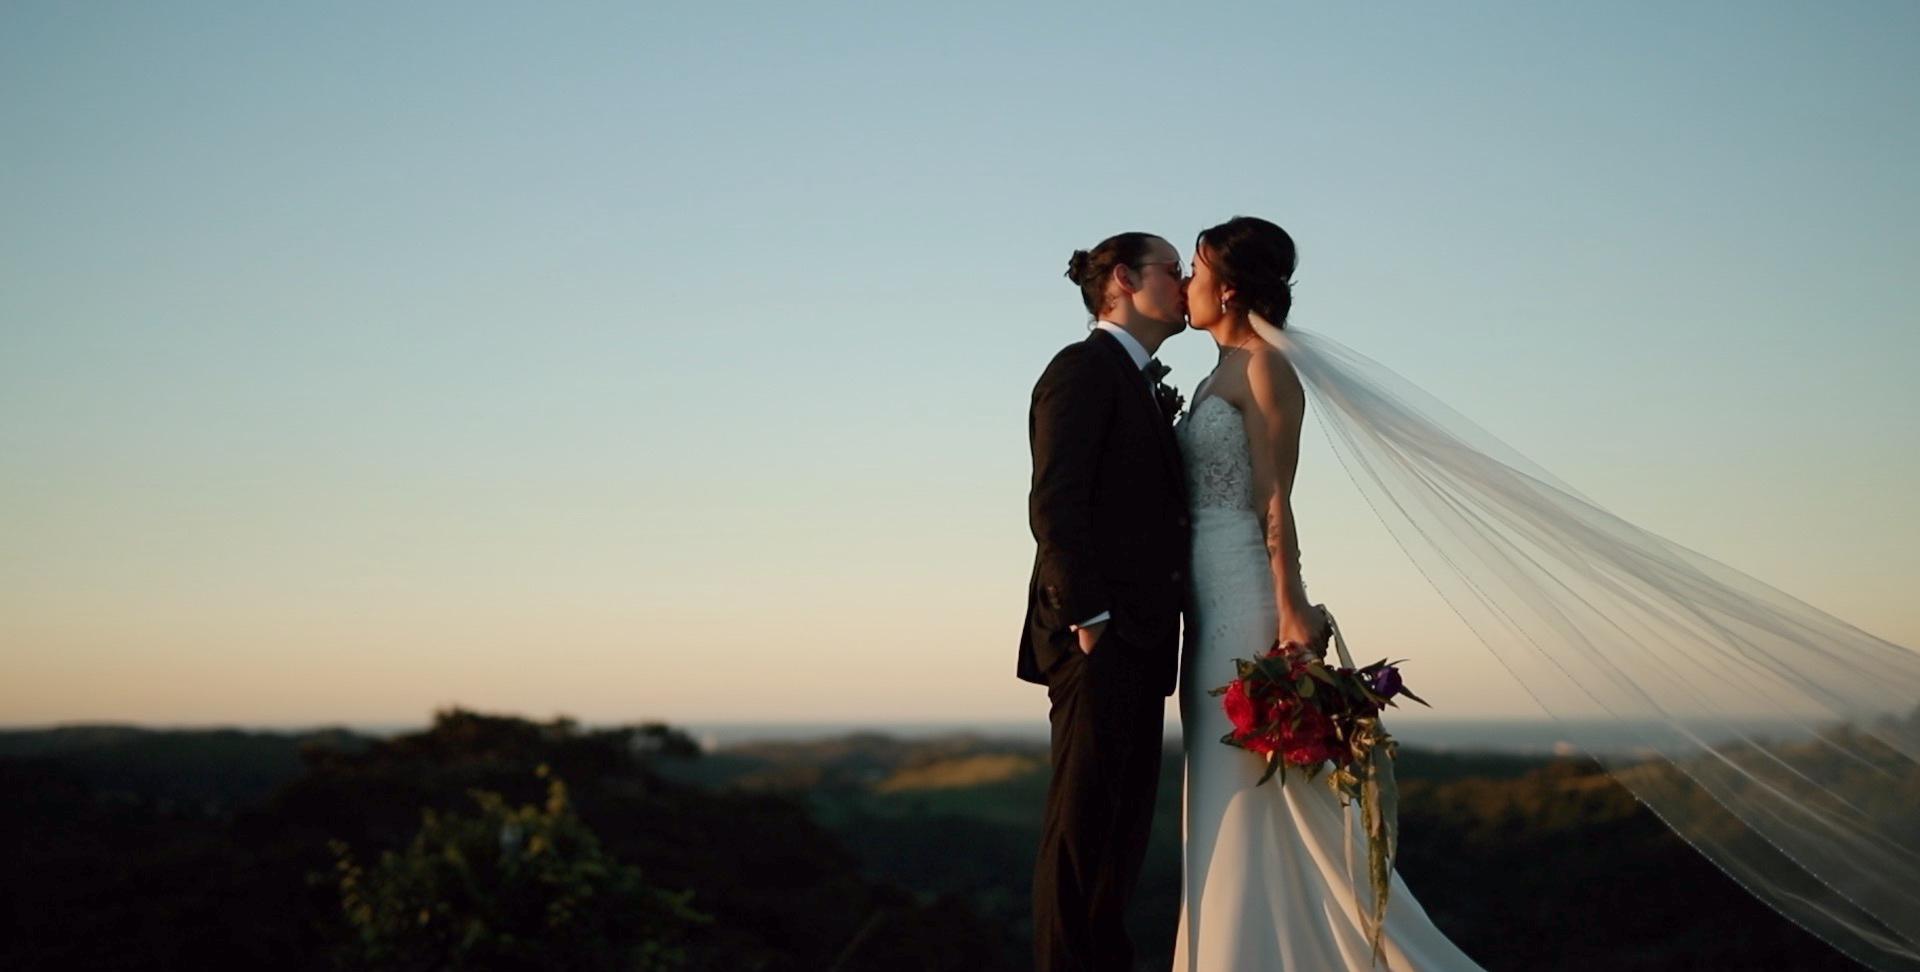 Brisbane based wedding videography.